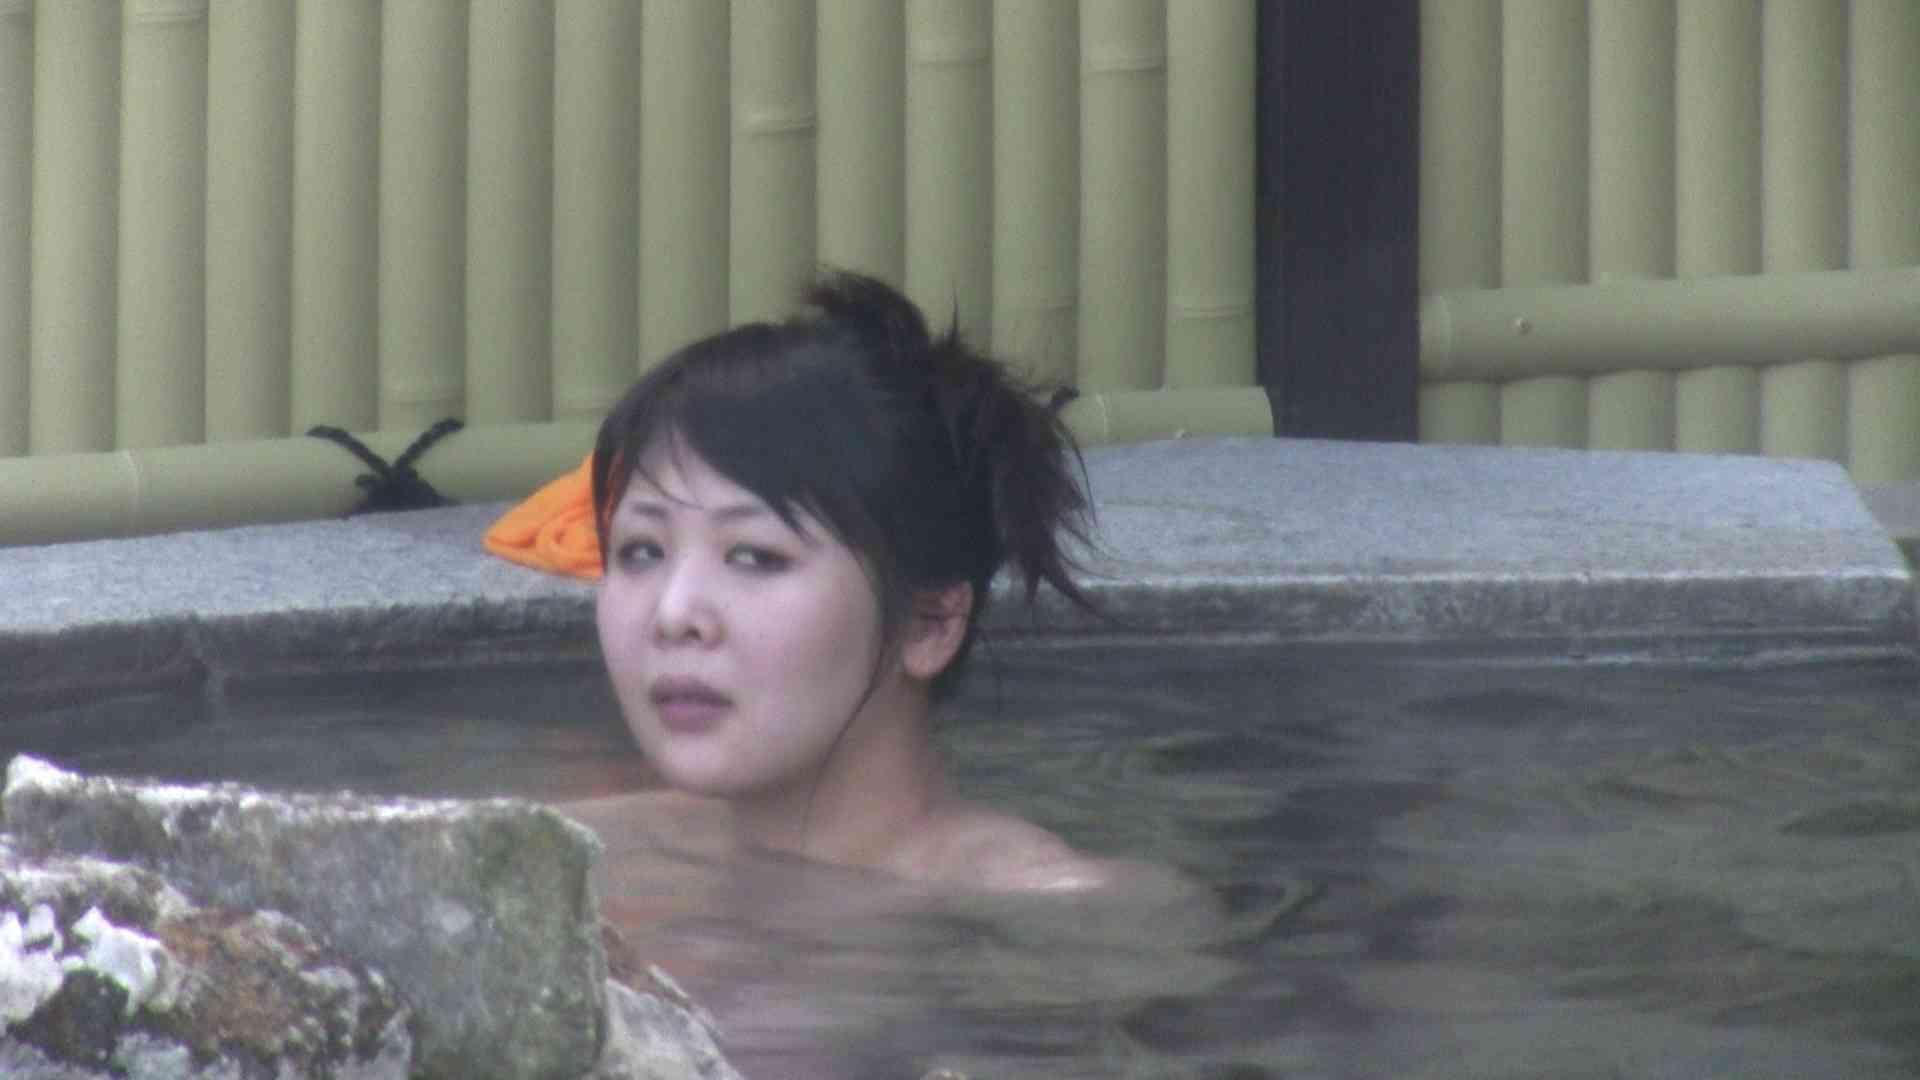 Aquaな露天風呂Vol.118 OL女体  68連発 3